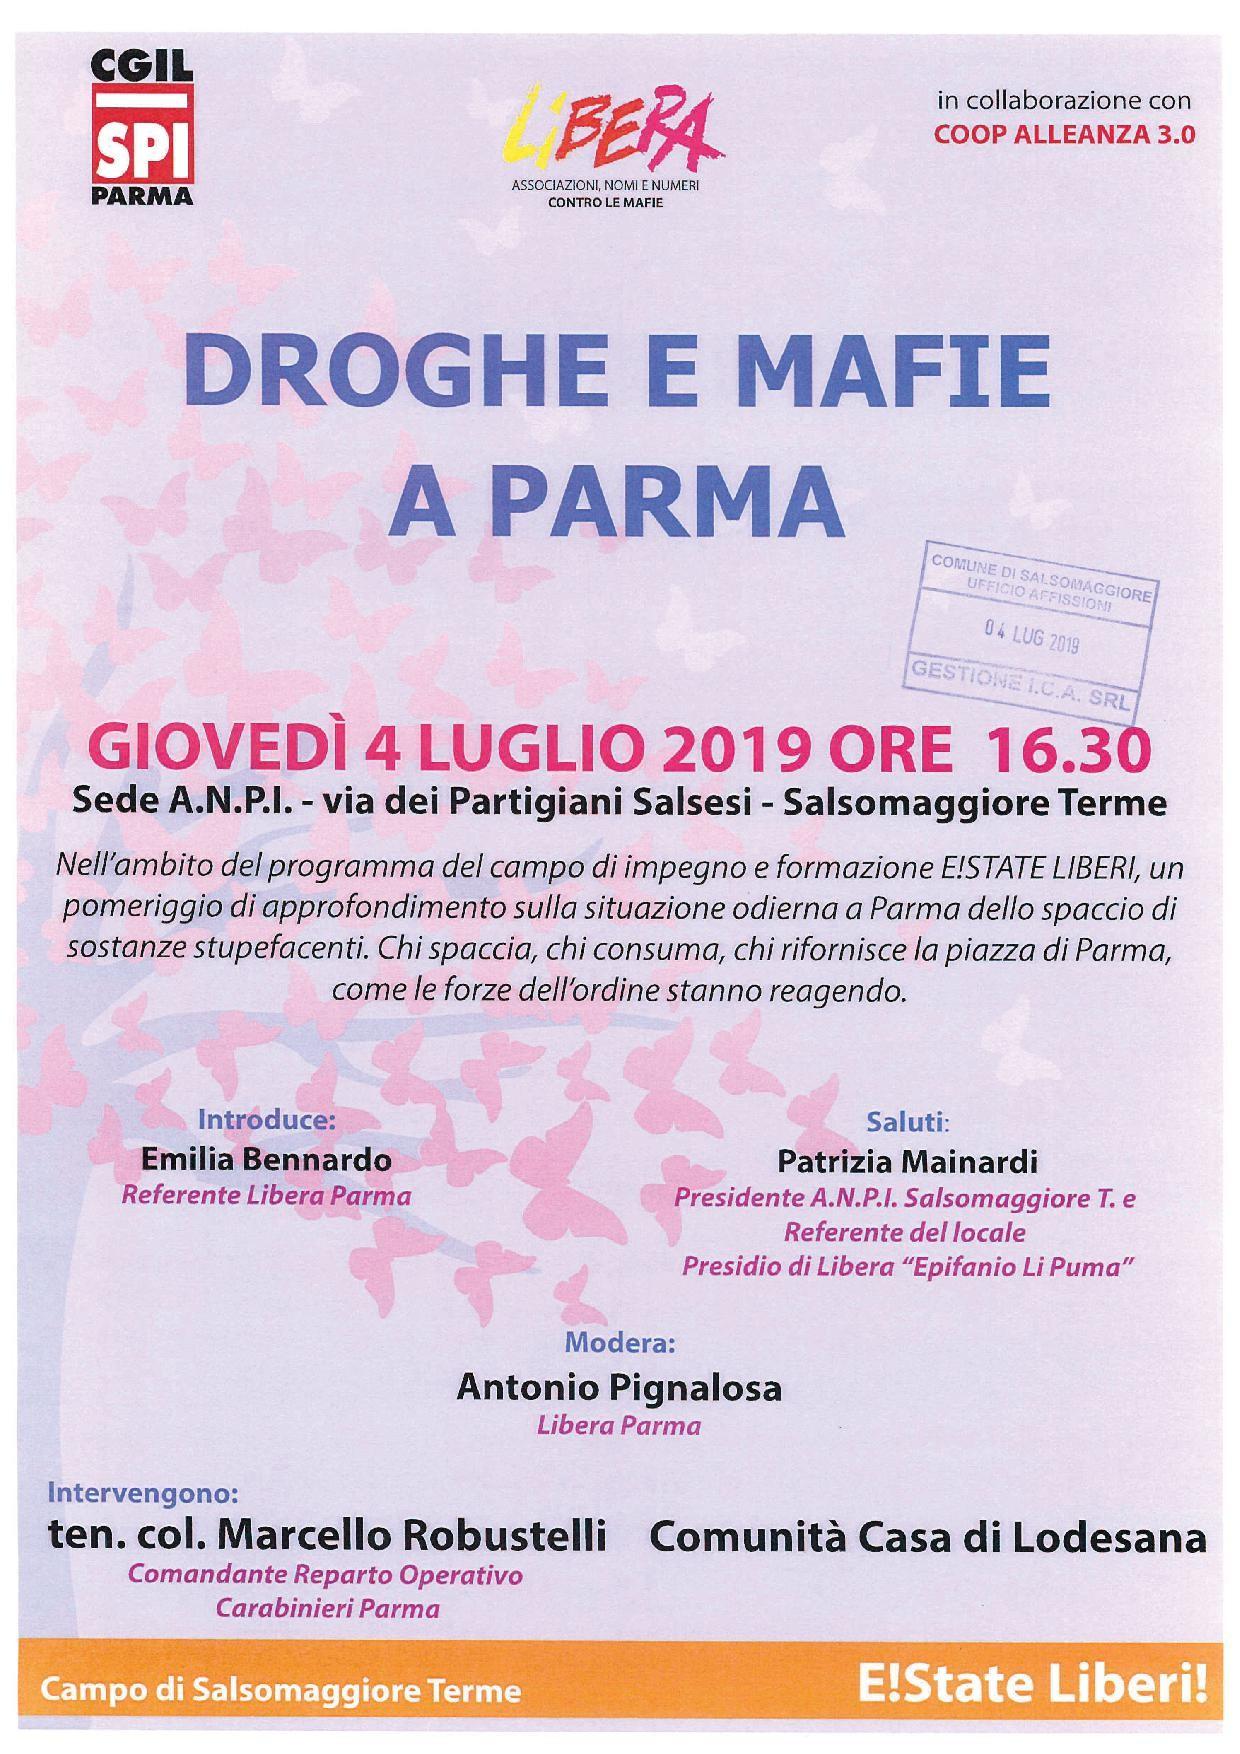 Droghe e mafie a Parma